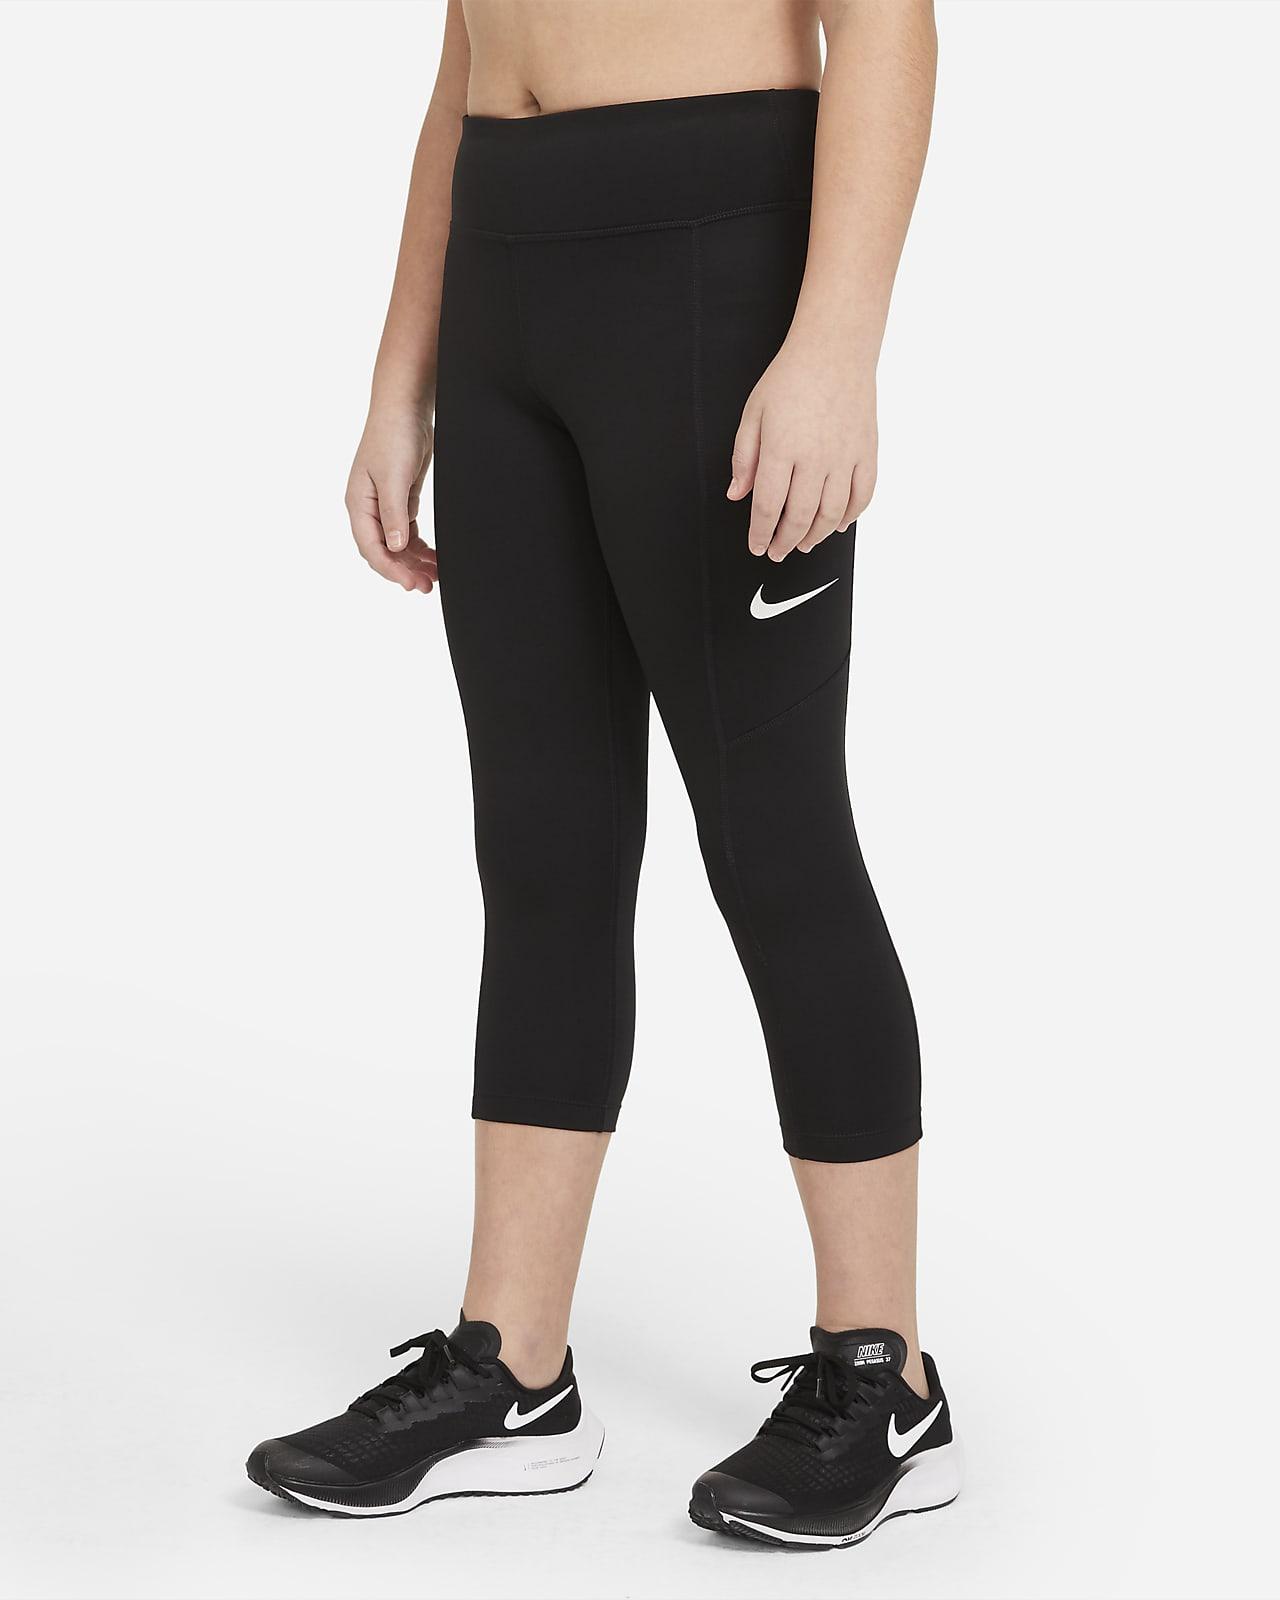 Capris de entrenamiento para niñas talla grande Nike Trophy (talla extendida)